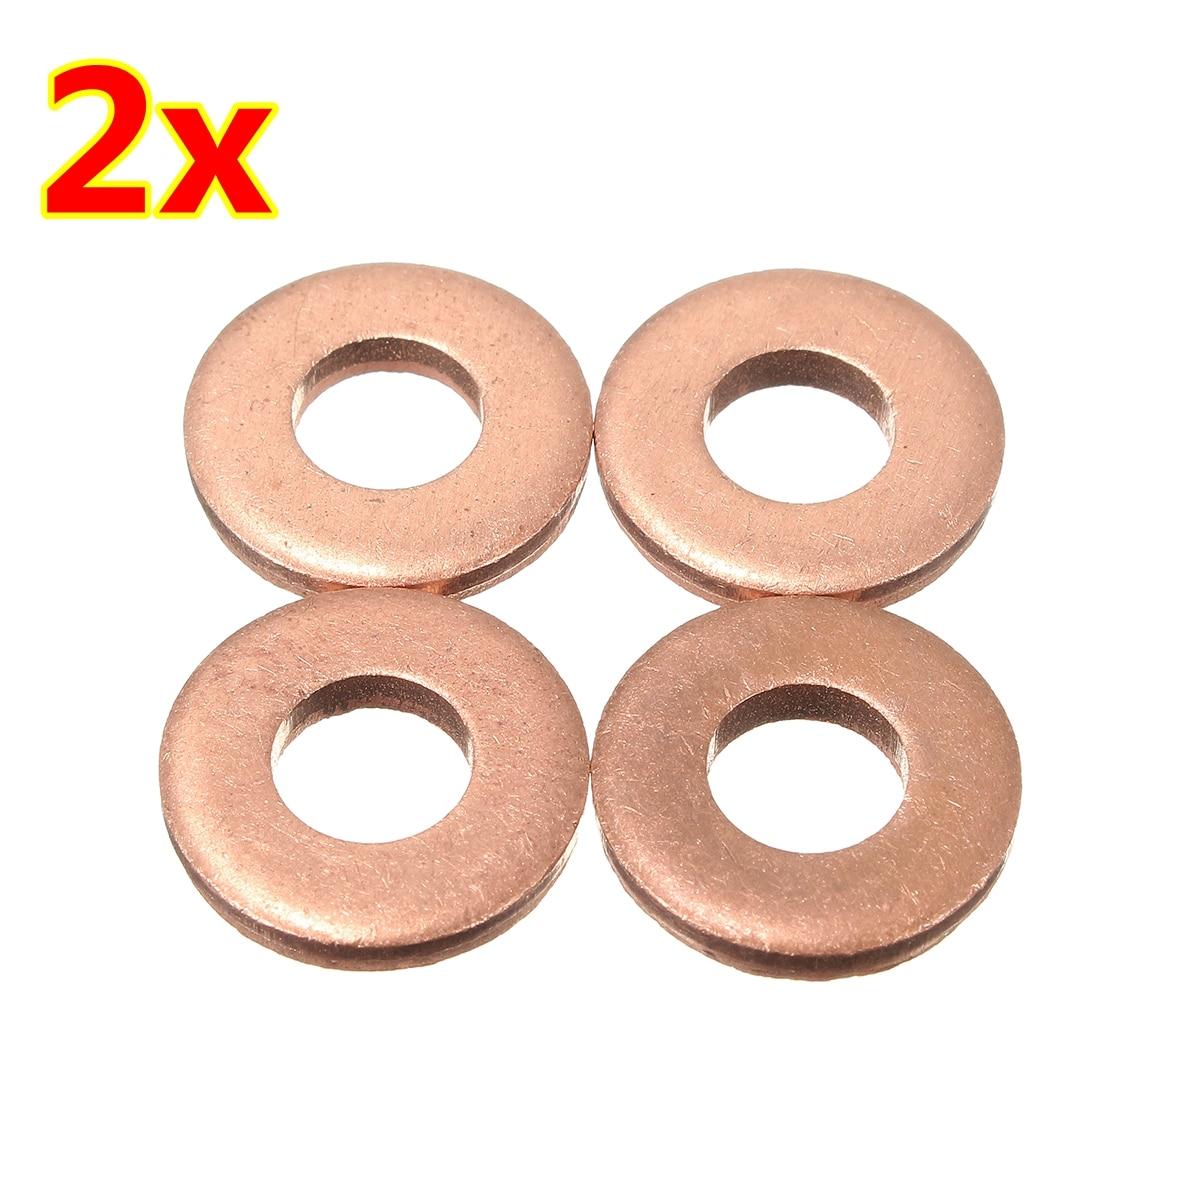 4pcs/8pcs  Injector Copper Washer Seals O-Ring For Peugeot / Citroen 1.6 HDI - 198173